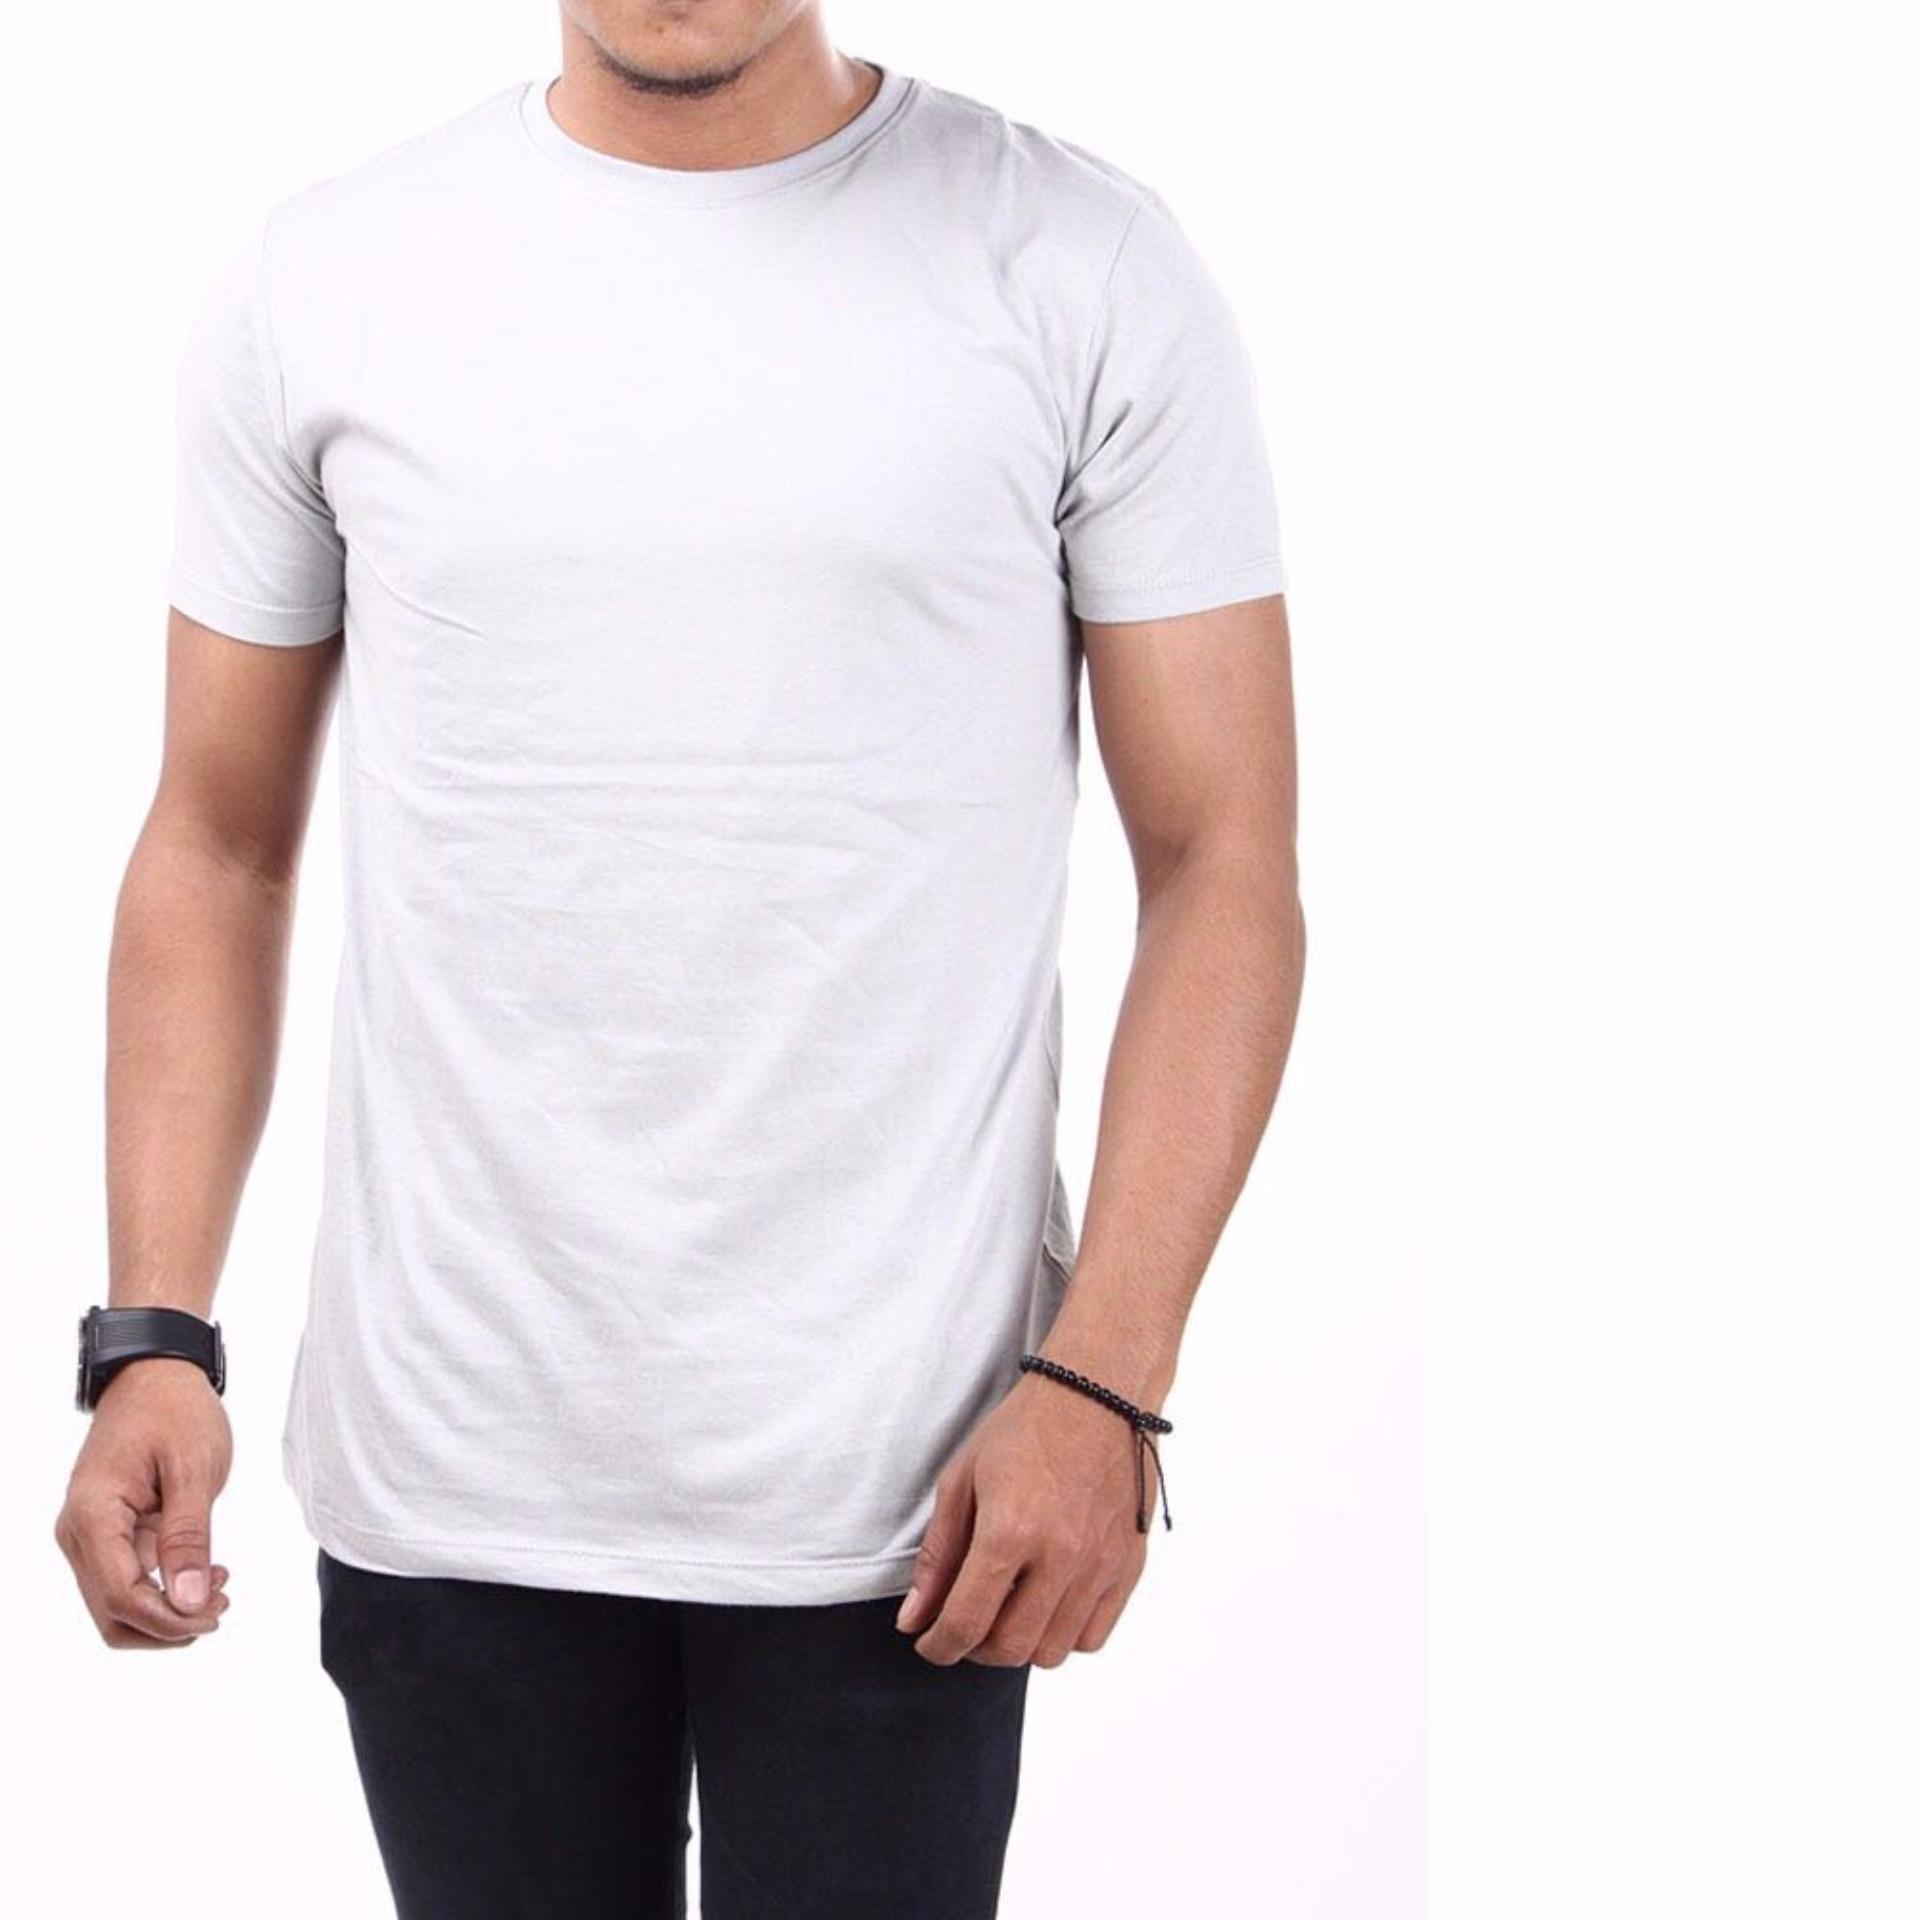 Irfan Store95 - Kaos Pendak O Neck - Abu Abu Terang